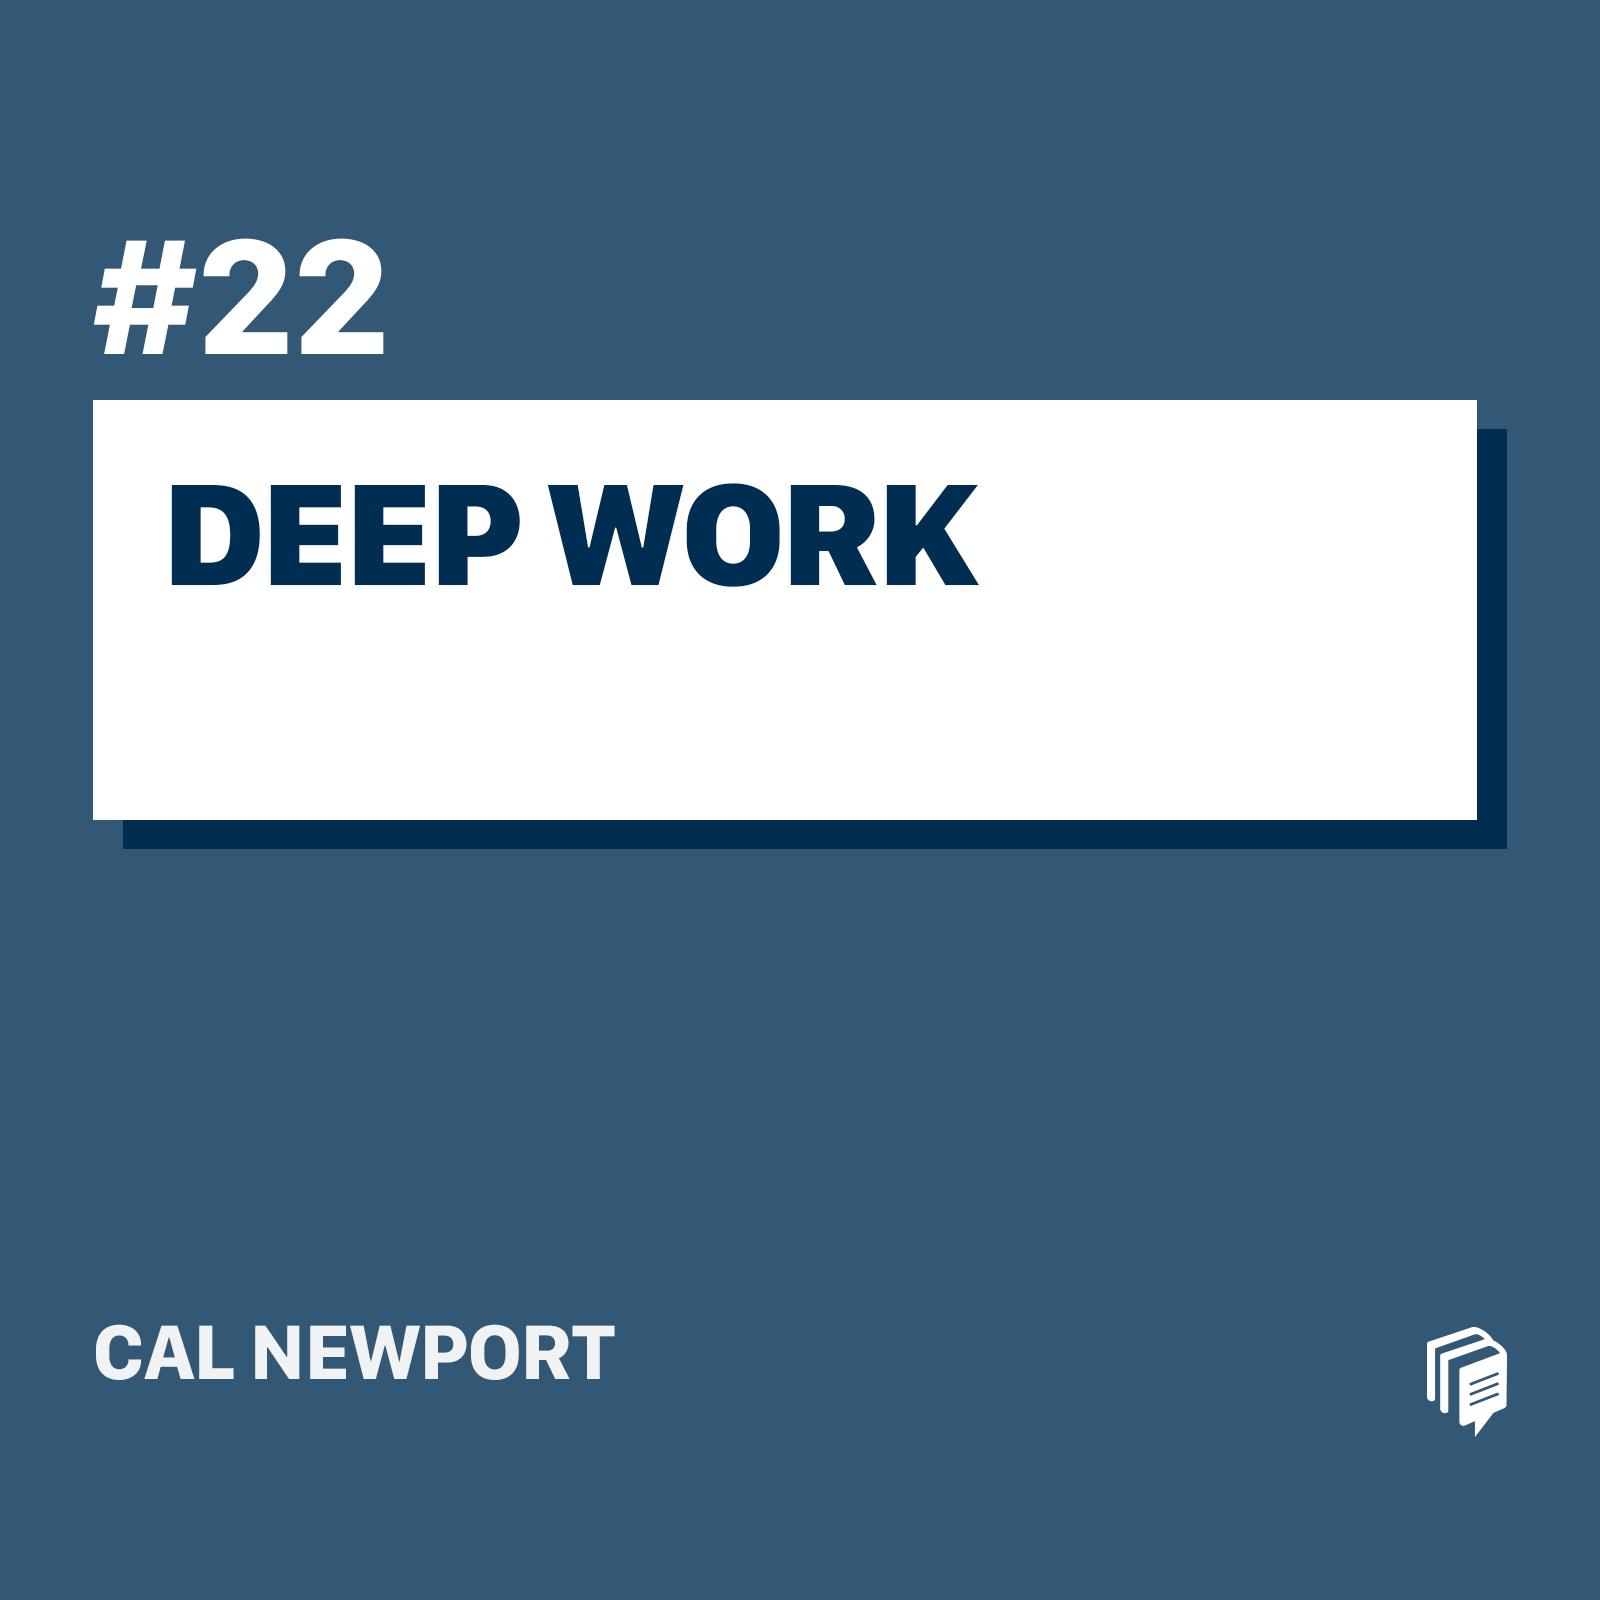 22: Deep Work (خلاصهی کتاب کار عمیق)